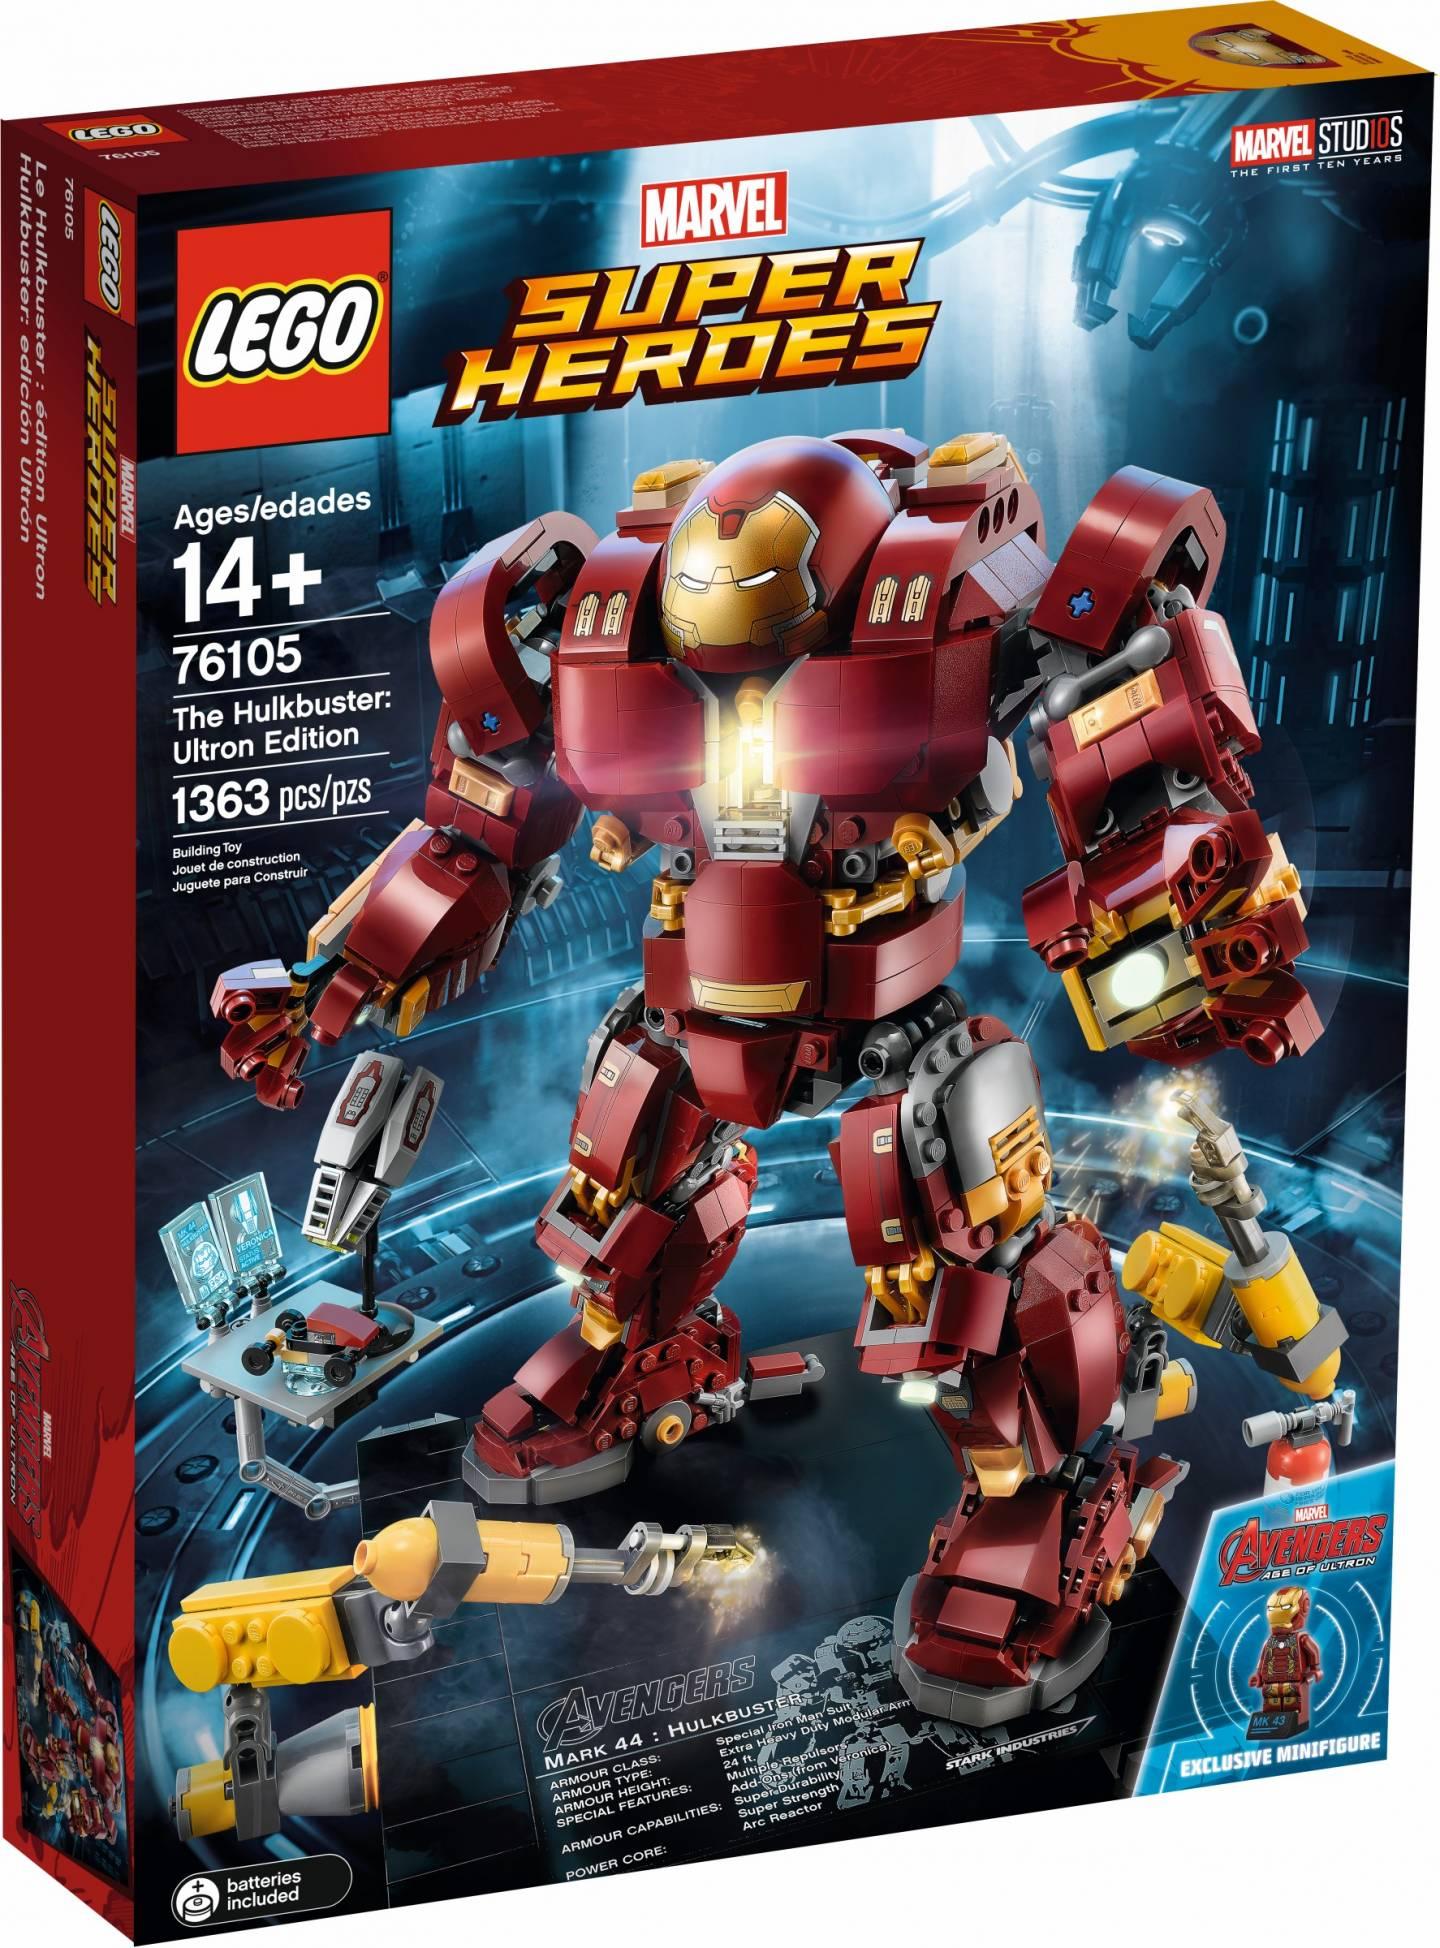 LEGO THE HULKBUSTER: ULTRON EDITION - 76105